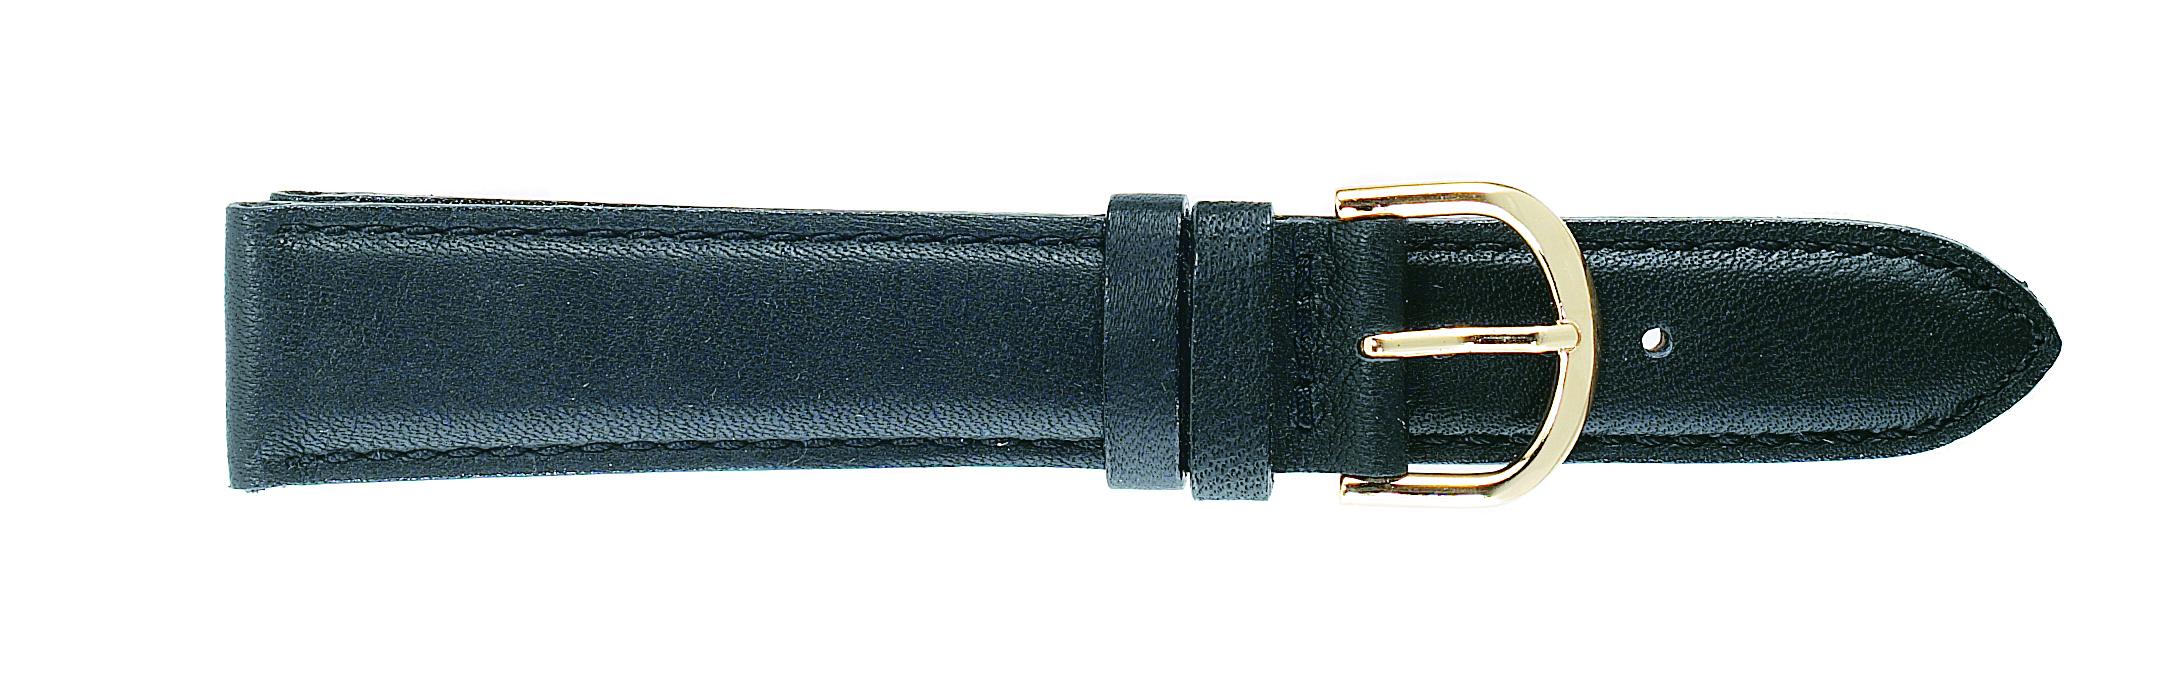 12mm Padded Calf Black Strap-0